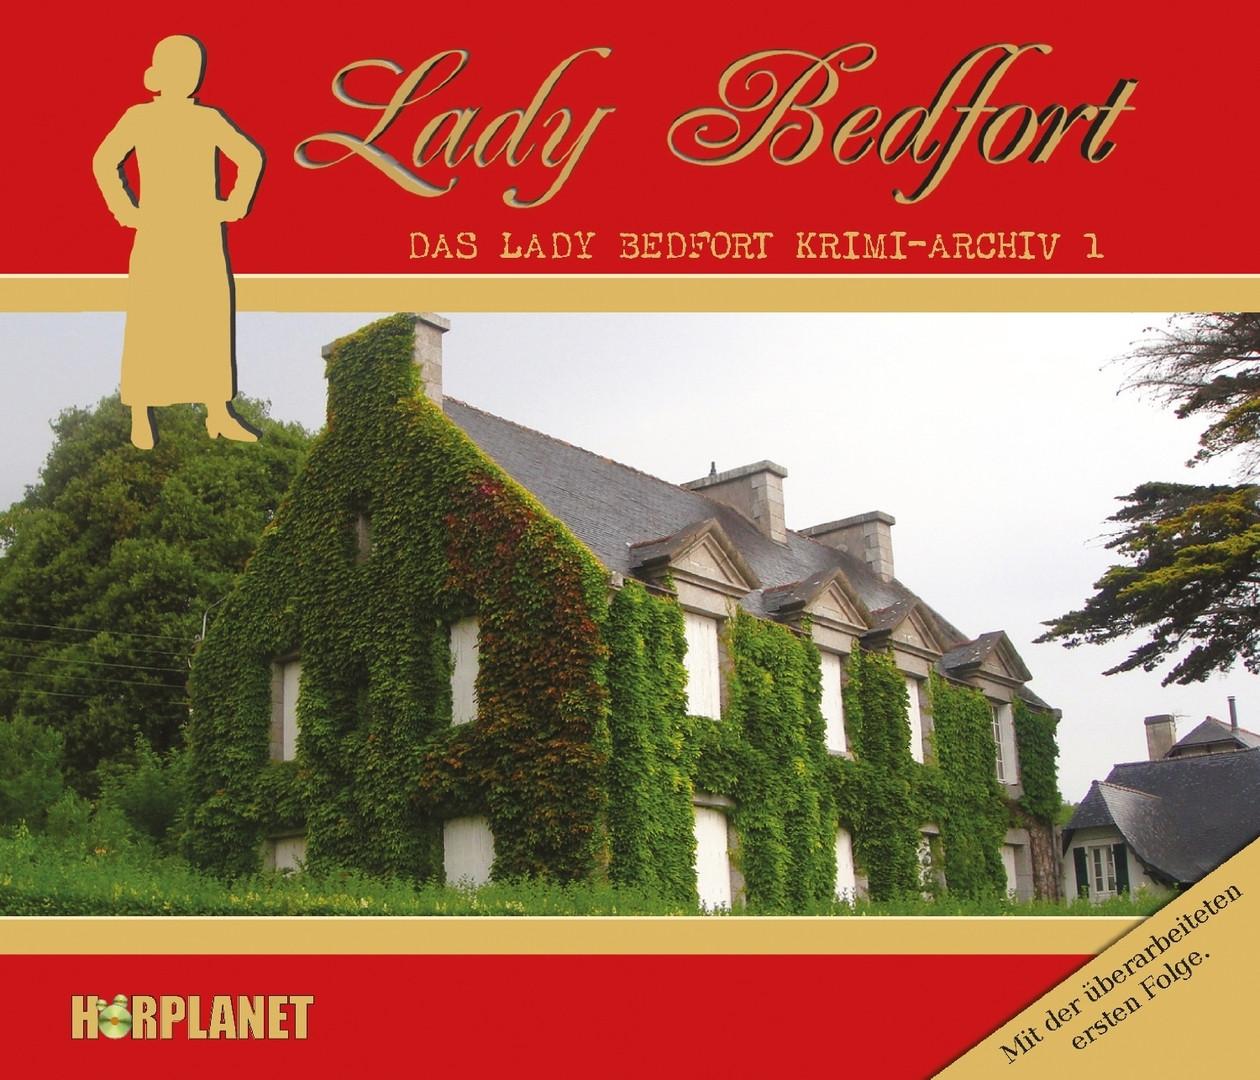 Lady Bedfort - Das Lady Bedfort Krimi-Archiv 1